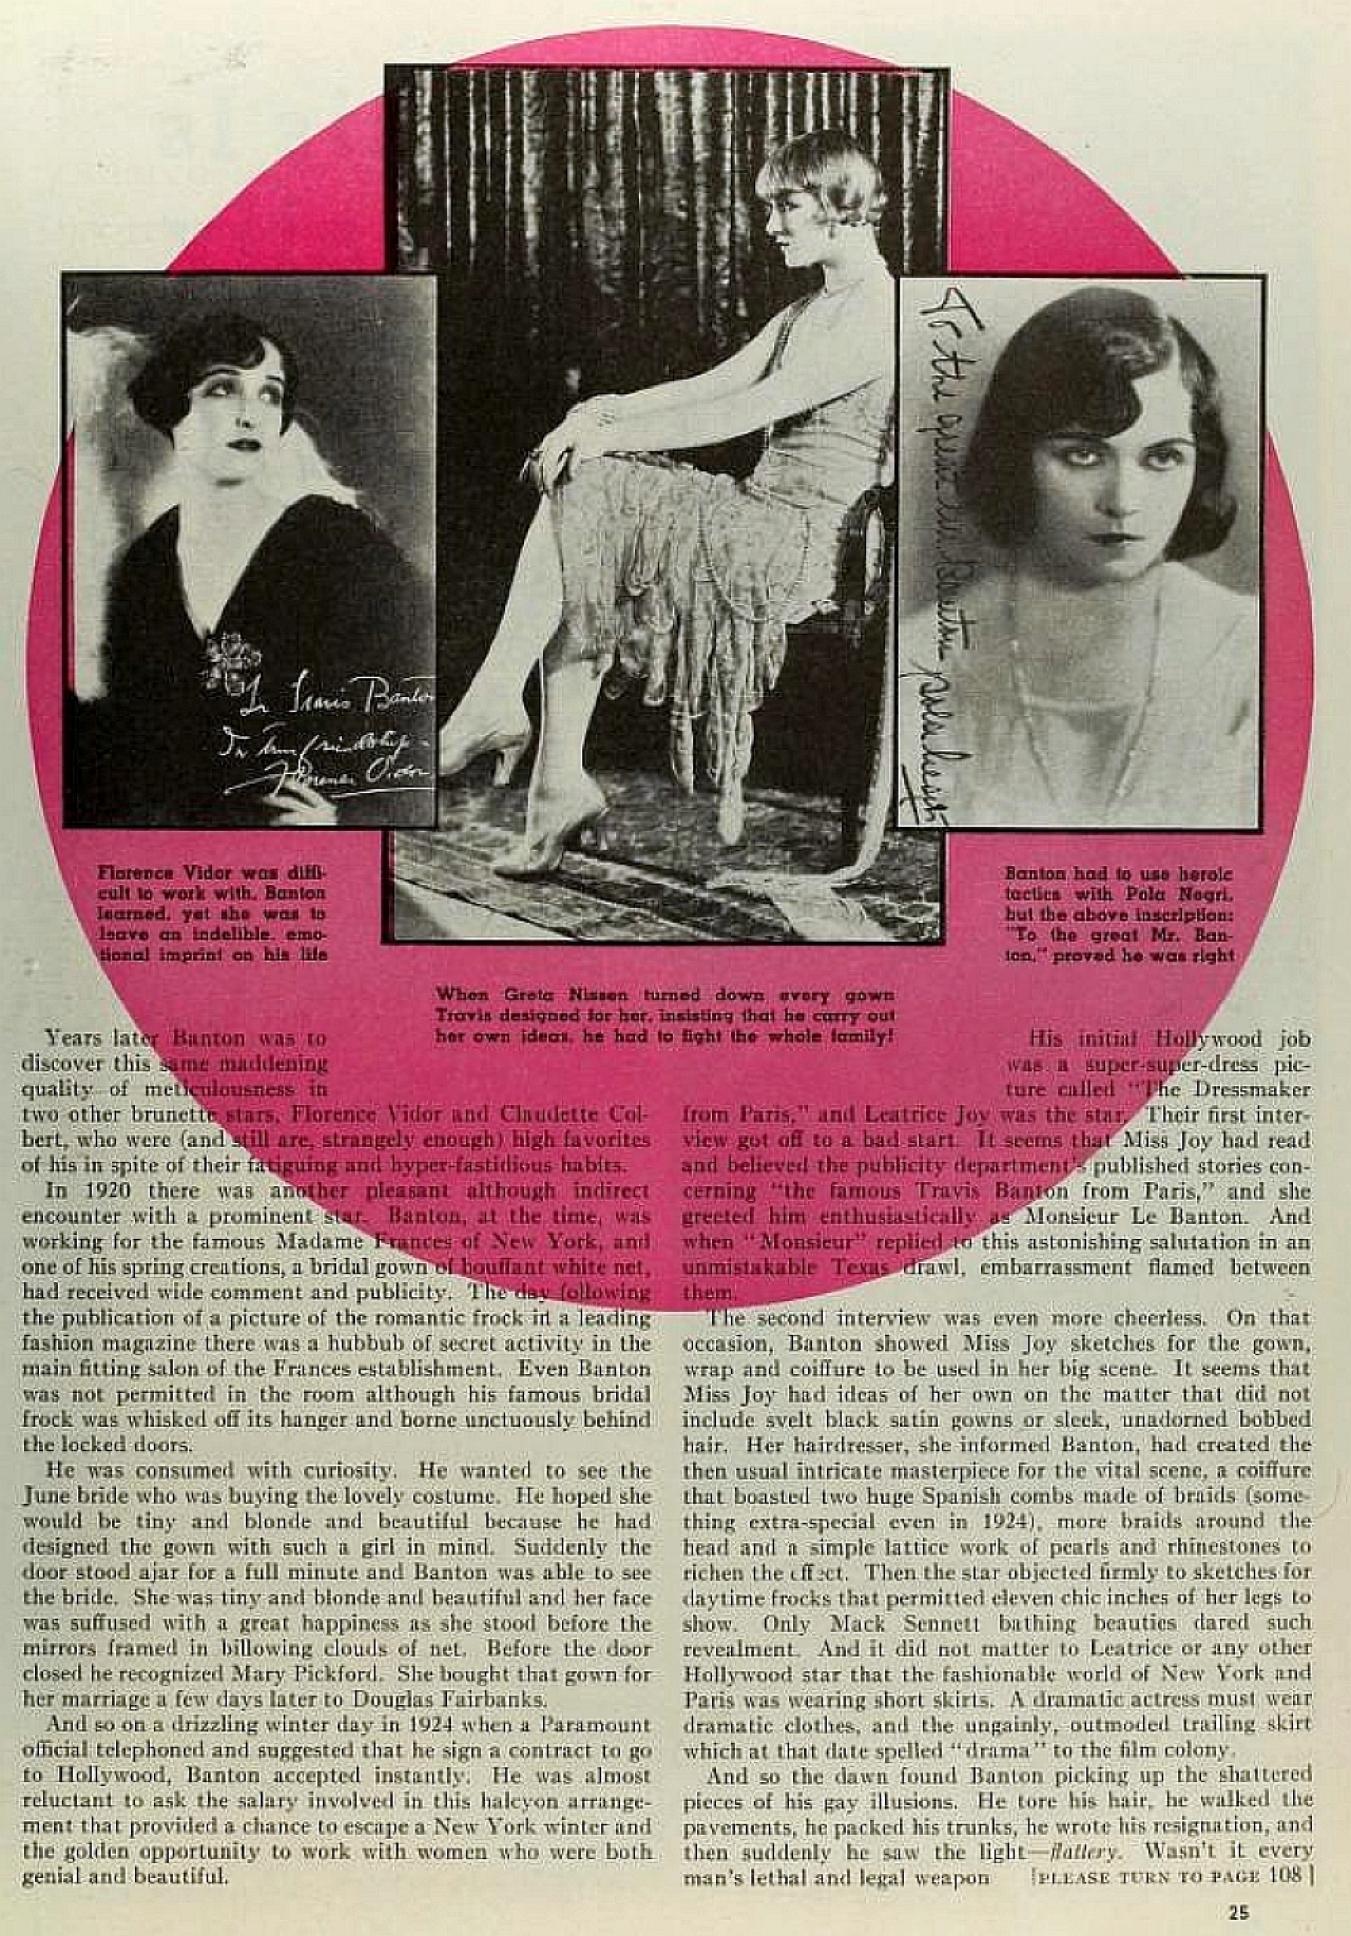 carole lombard photoplay april 1936 travis banton 02a larger